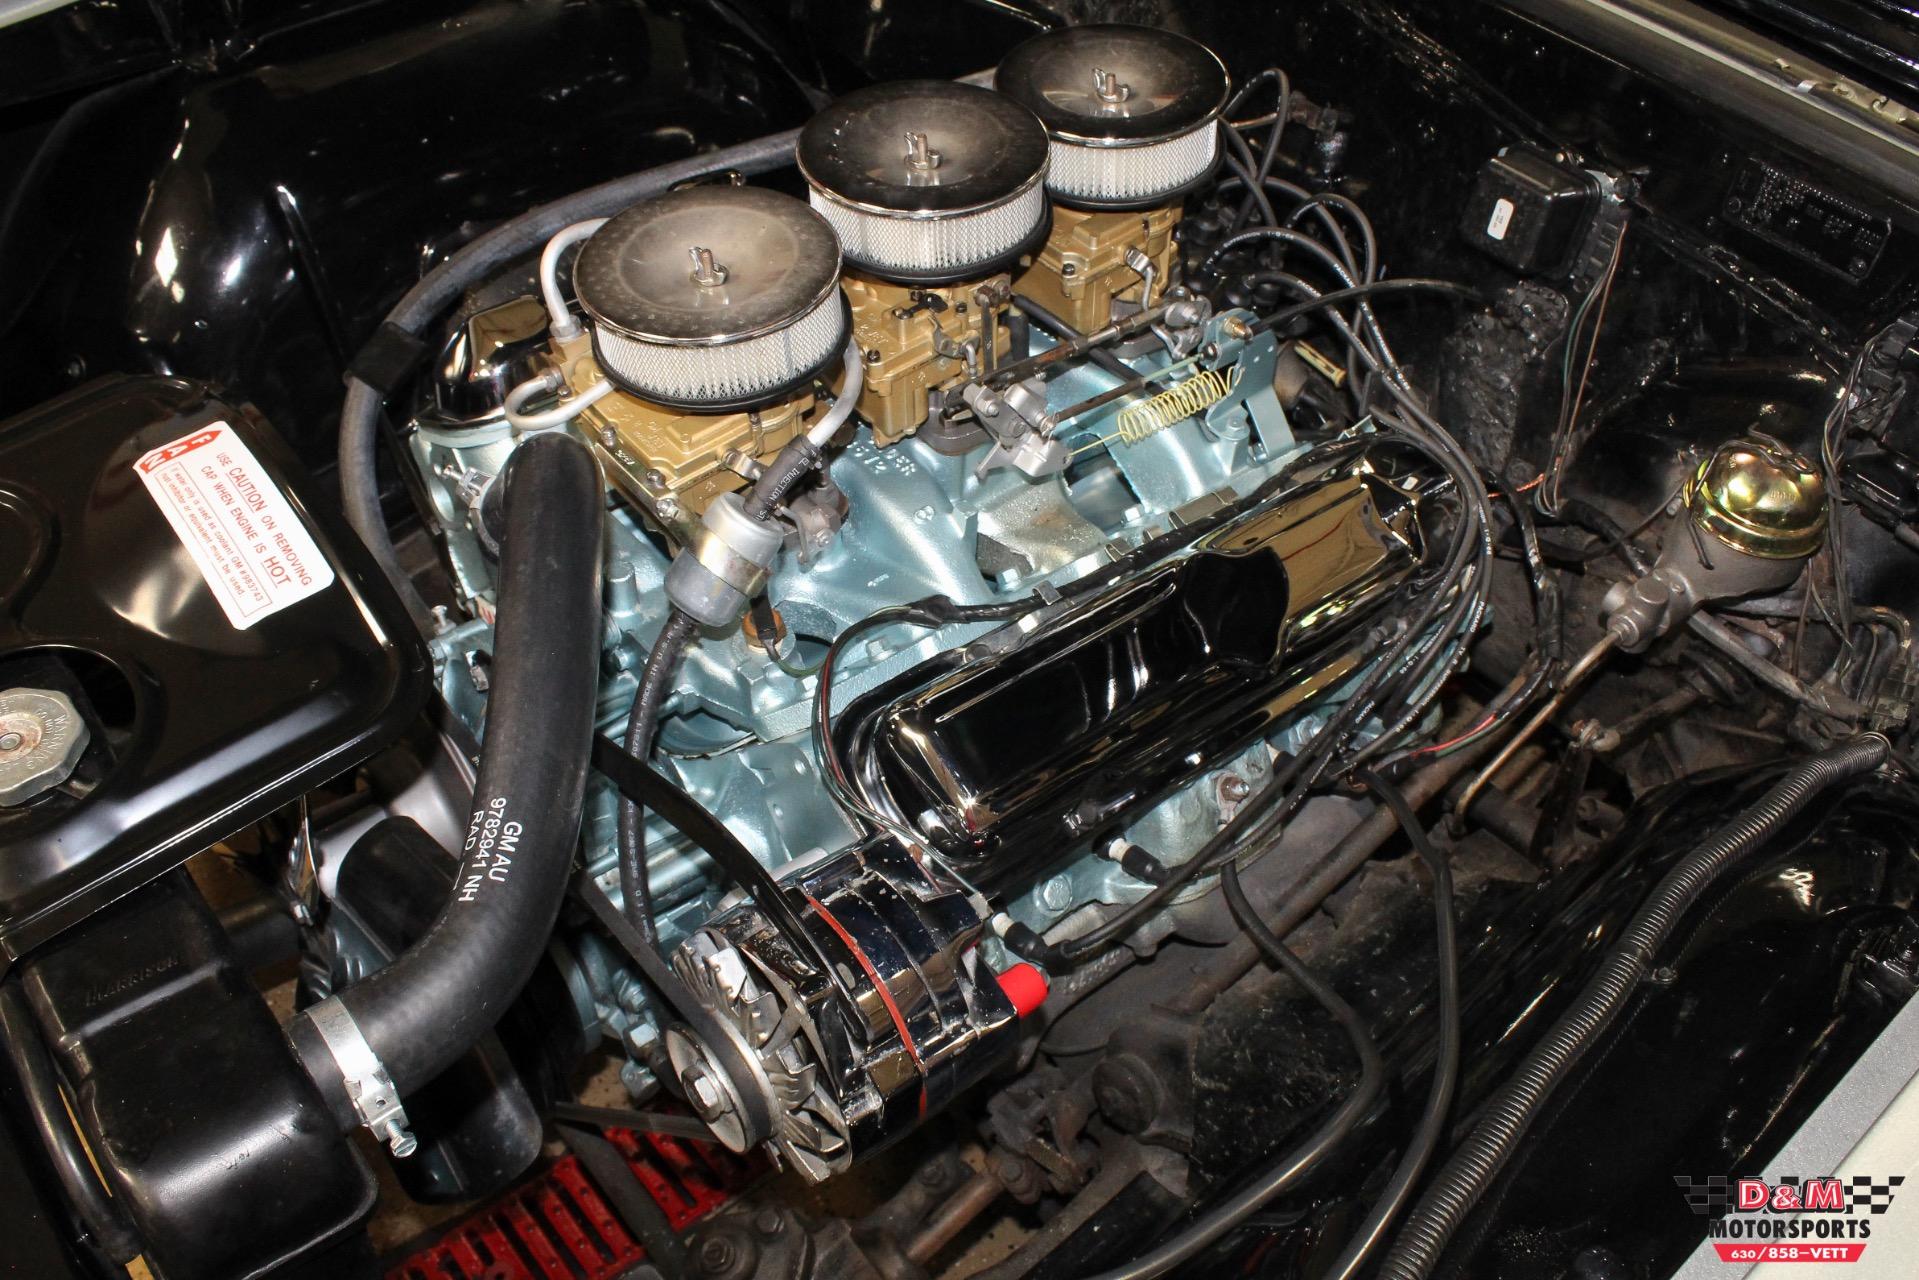 1966 Pontiac Gto Post Stock M6194 For Sale Near Glen Ellyn Il Engine Coolant Used